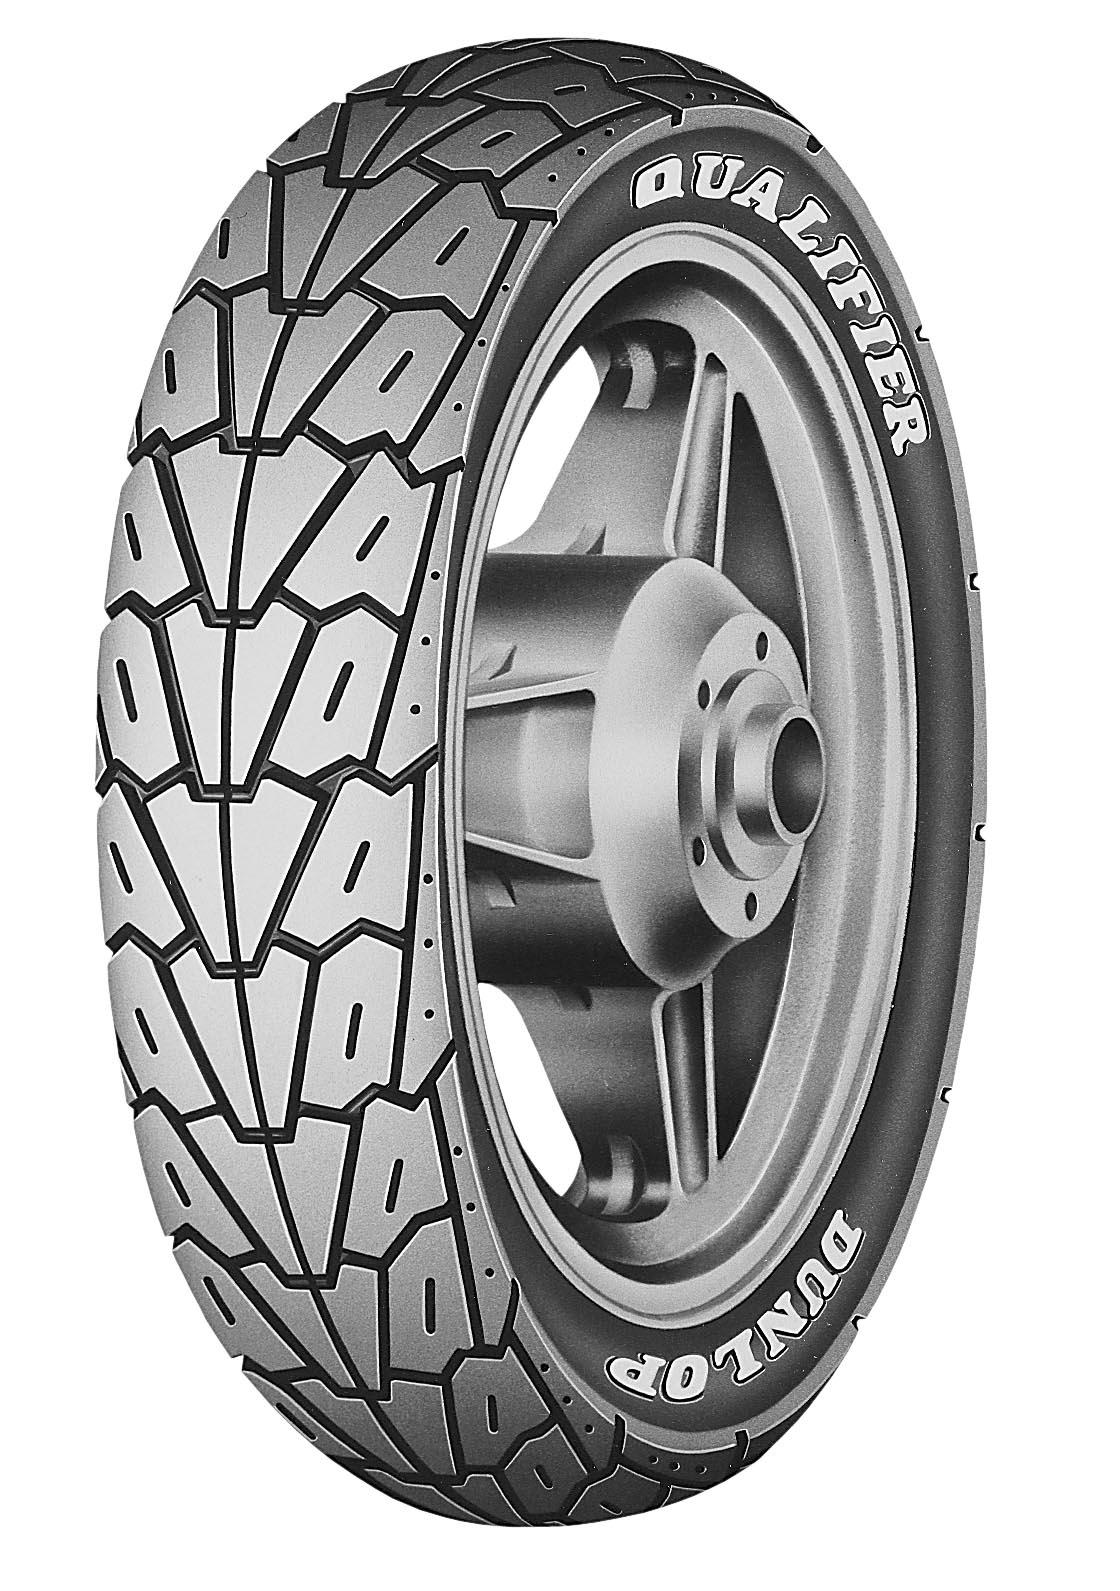 Dunlop K525 Qualifier Tire